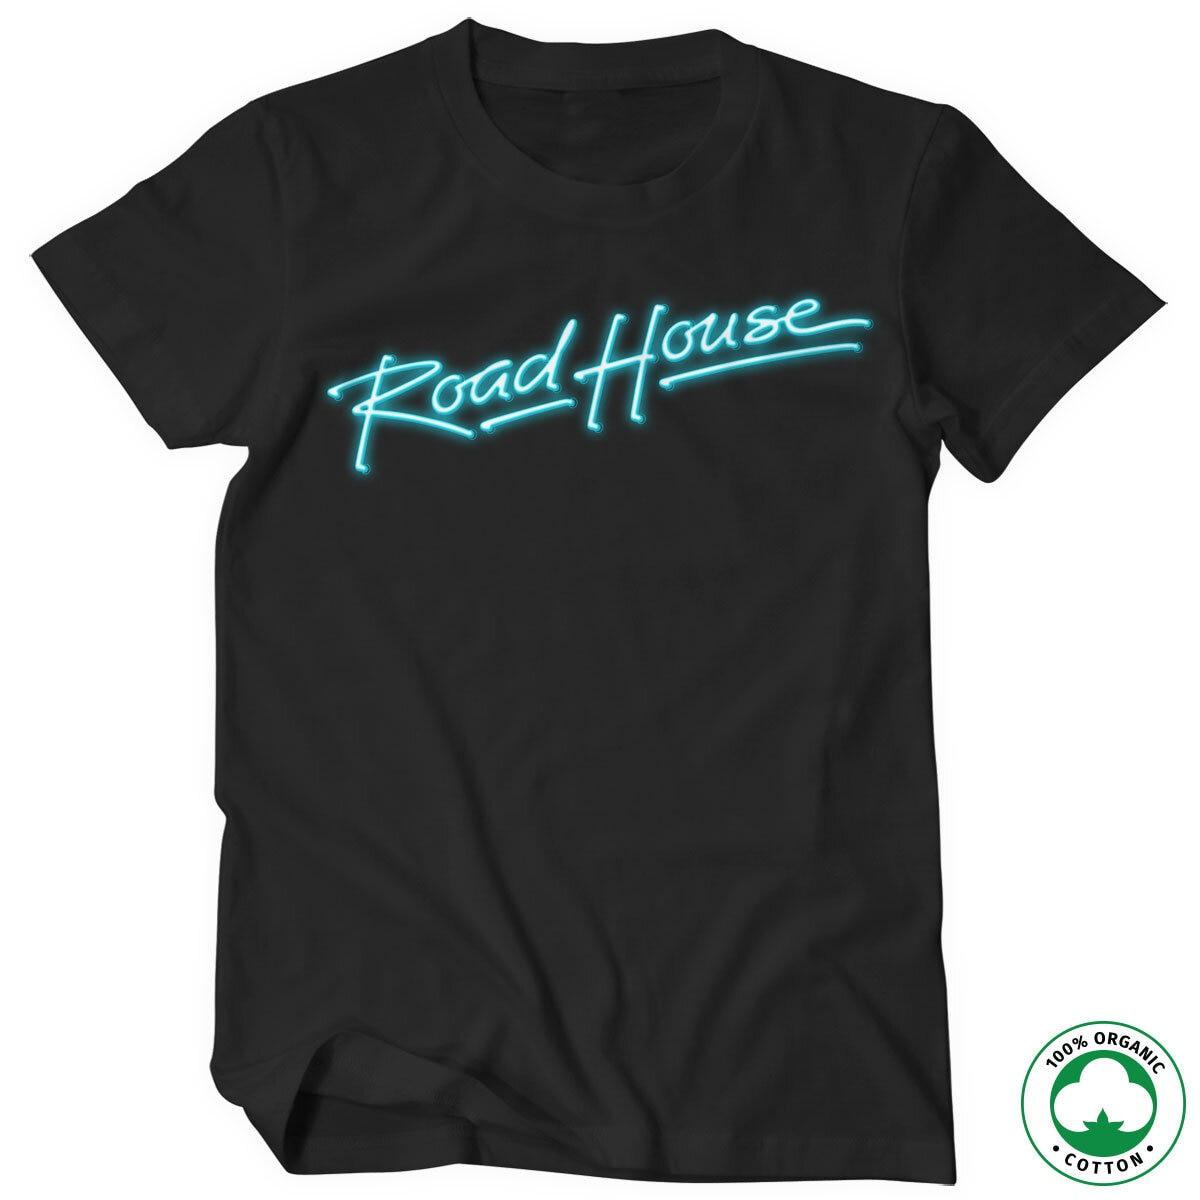 Road House Logo Organic T-Shirt